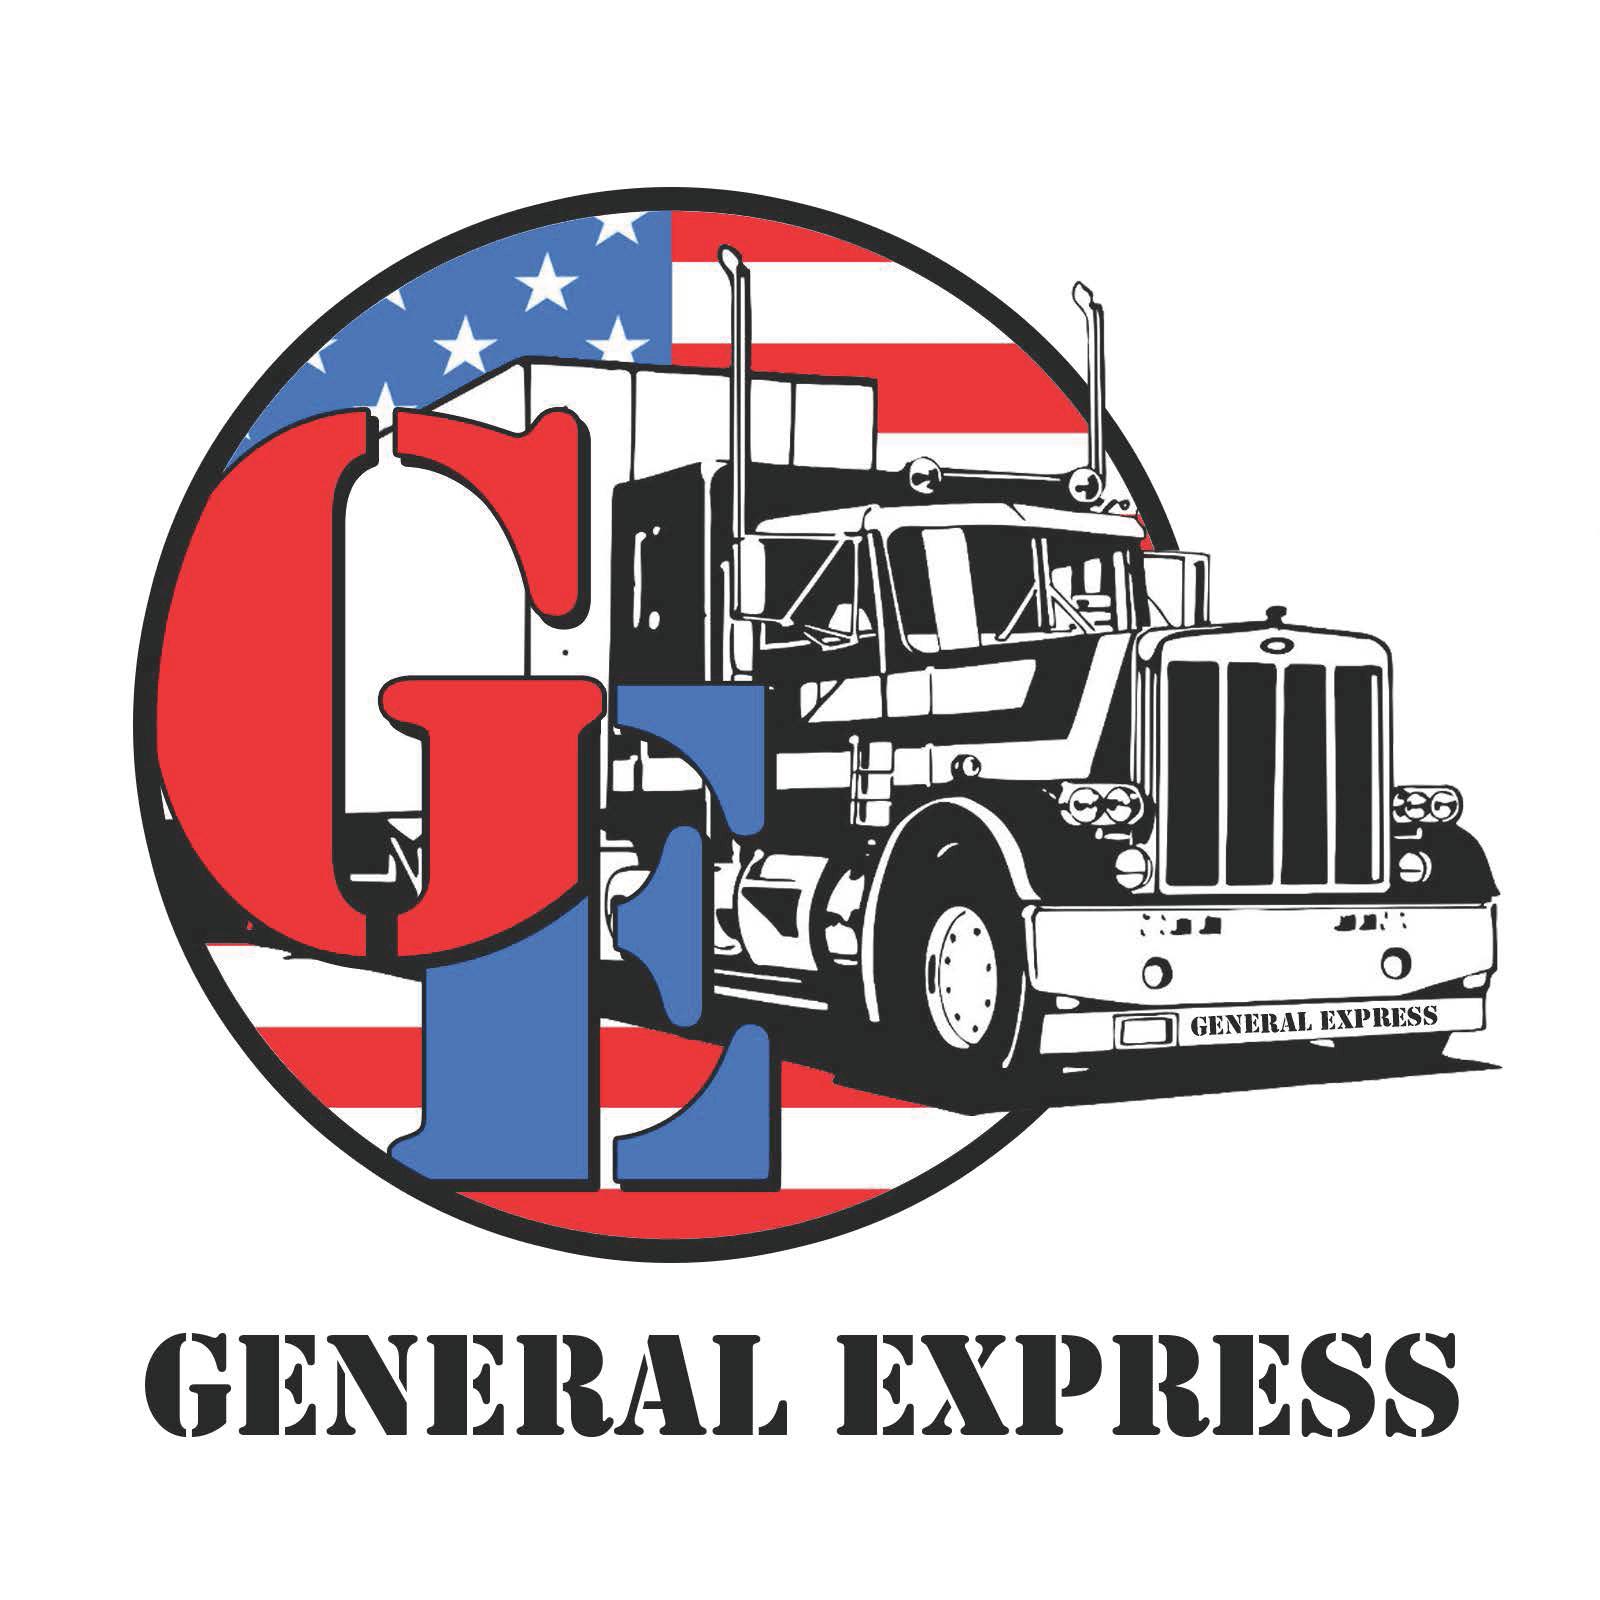 General Express